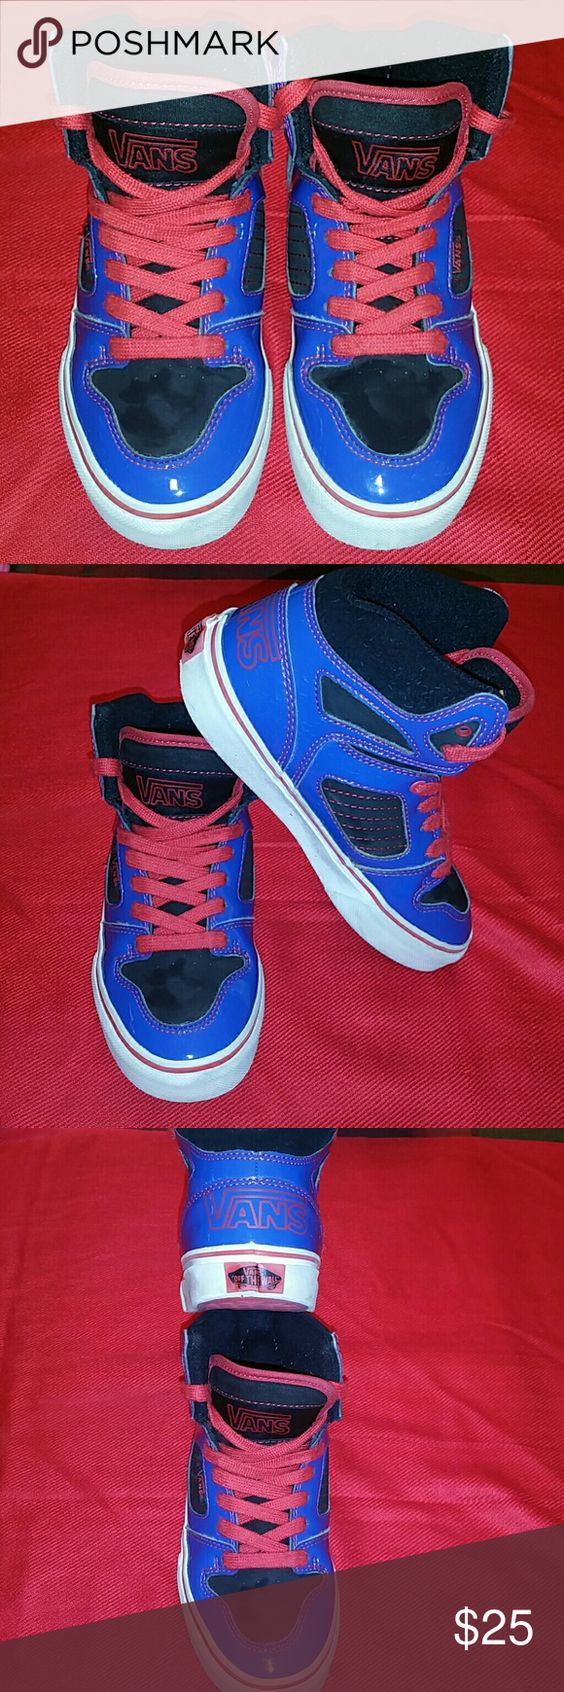 Kids sneakers Kids blue and red off the wall vans Vans Shoes Sneakers